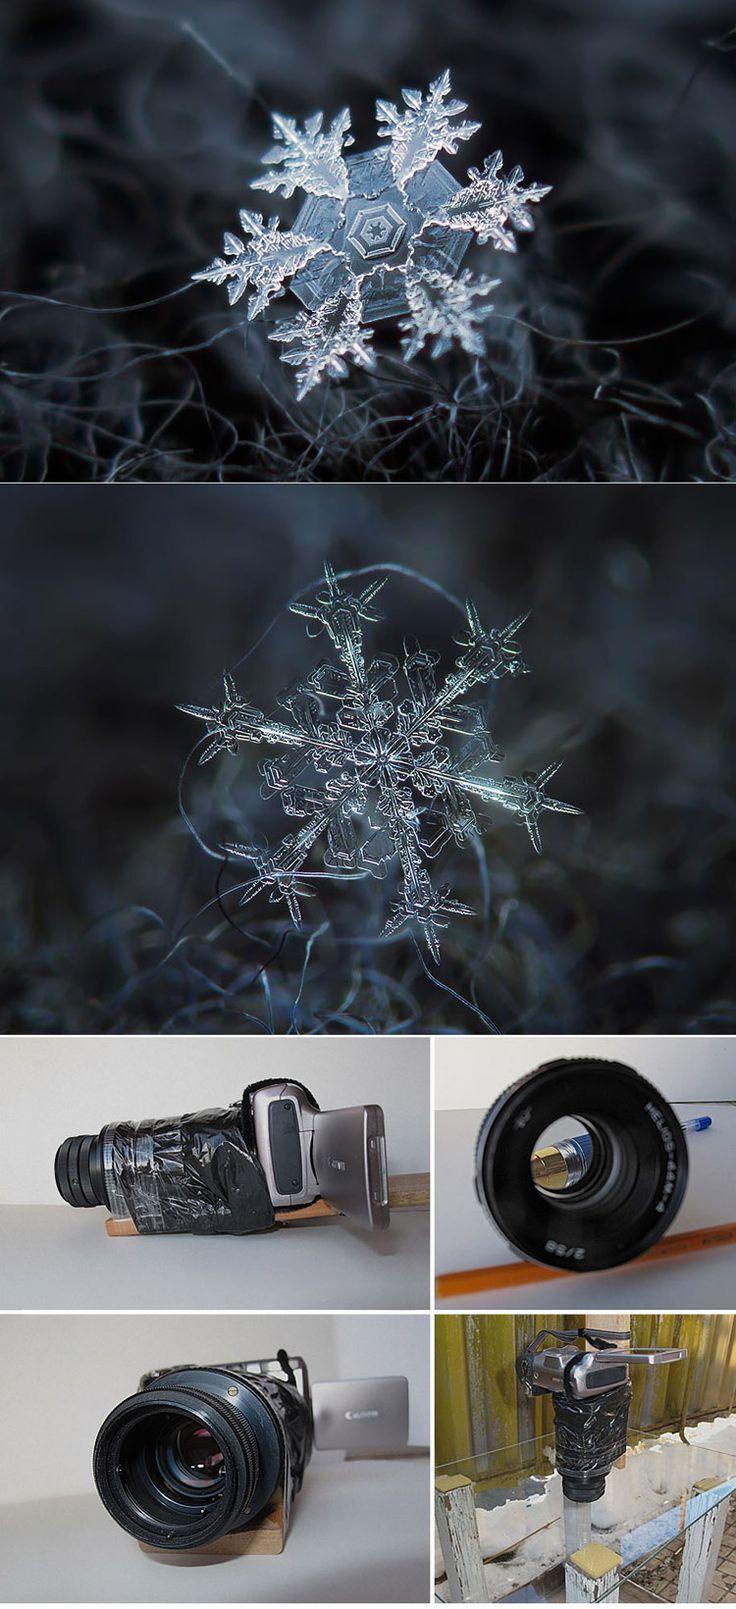 Photographer Tapes a $50 Lens To His Point&shoot Camera To Take Stunning Macro Snowflake Photos ( http://www.demilked.com/macro-snowflakes-diy-camera-alexey-kljatov/ )